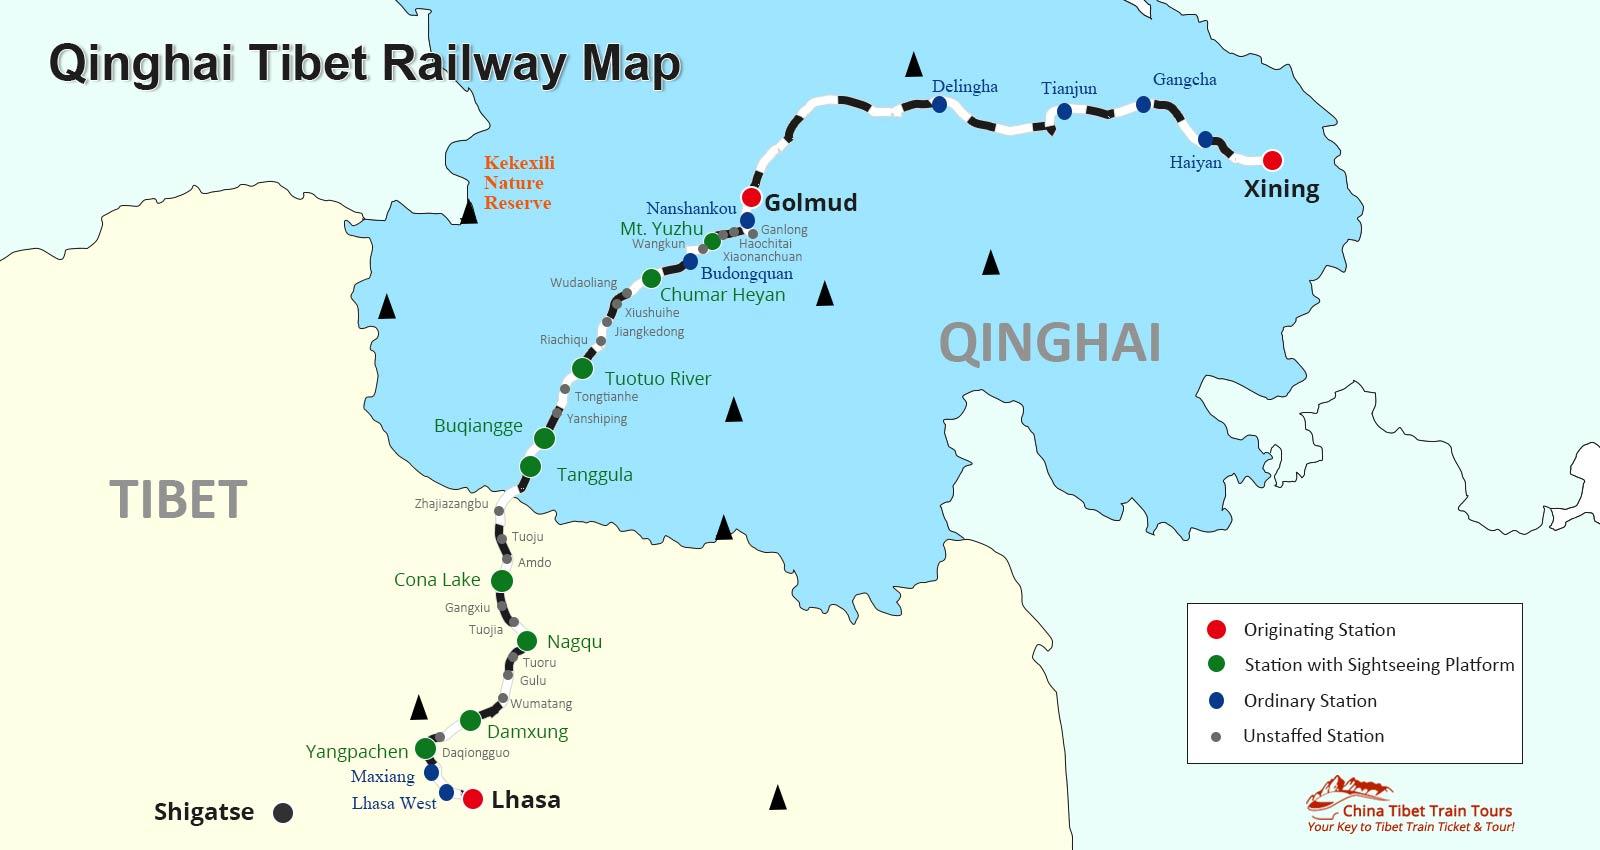 Travel China Tibet Train Tour